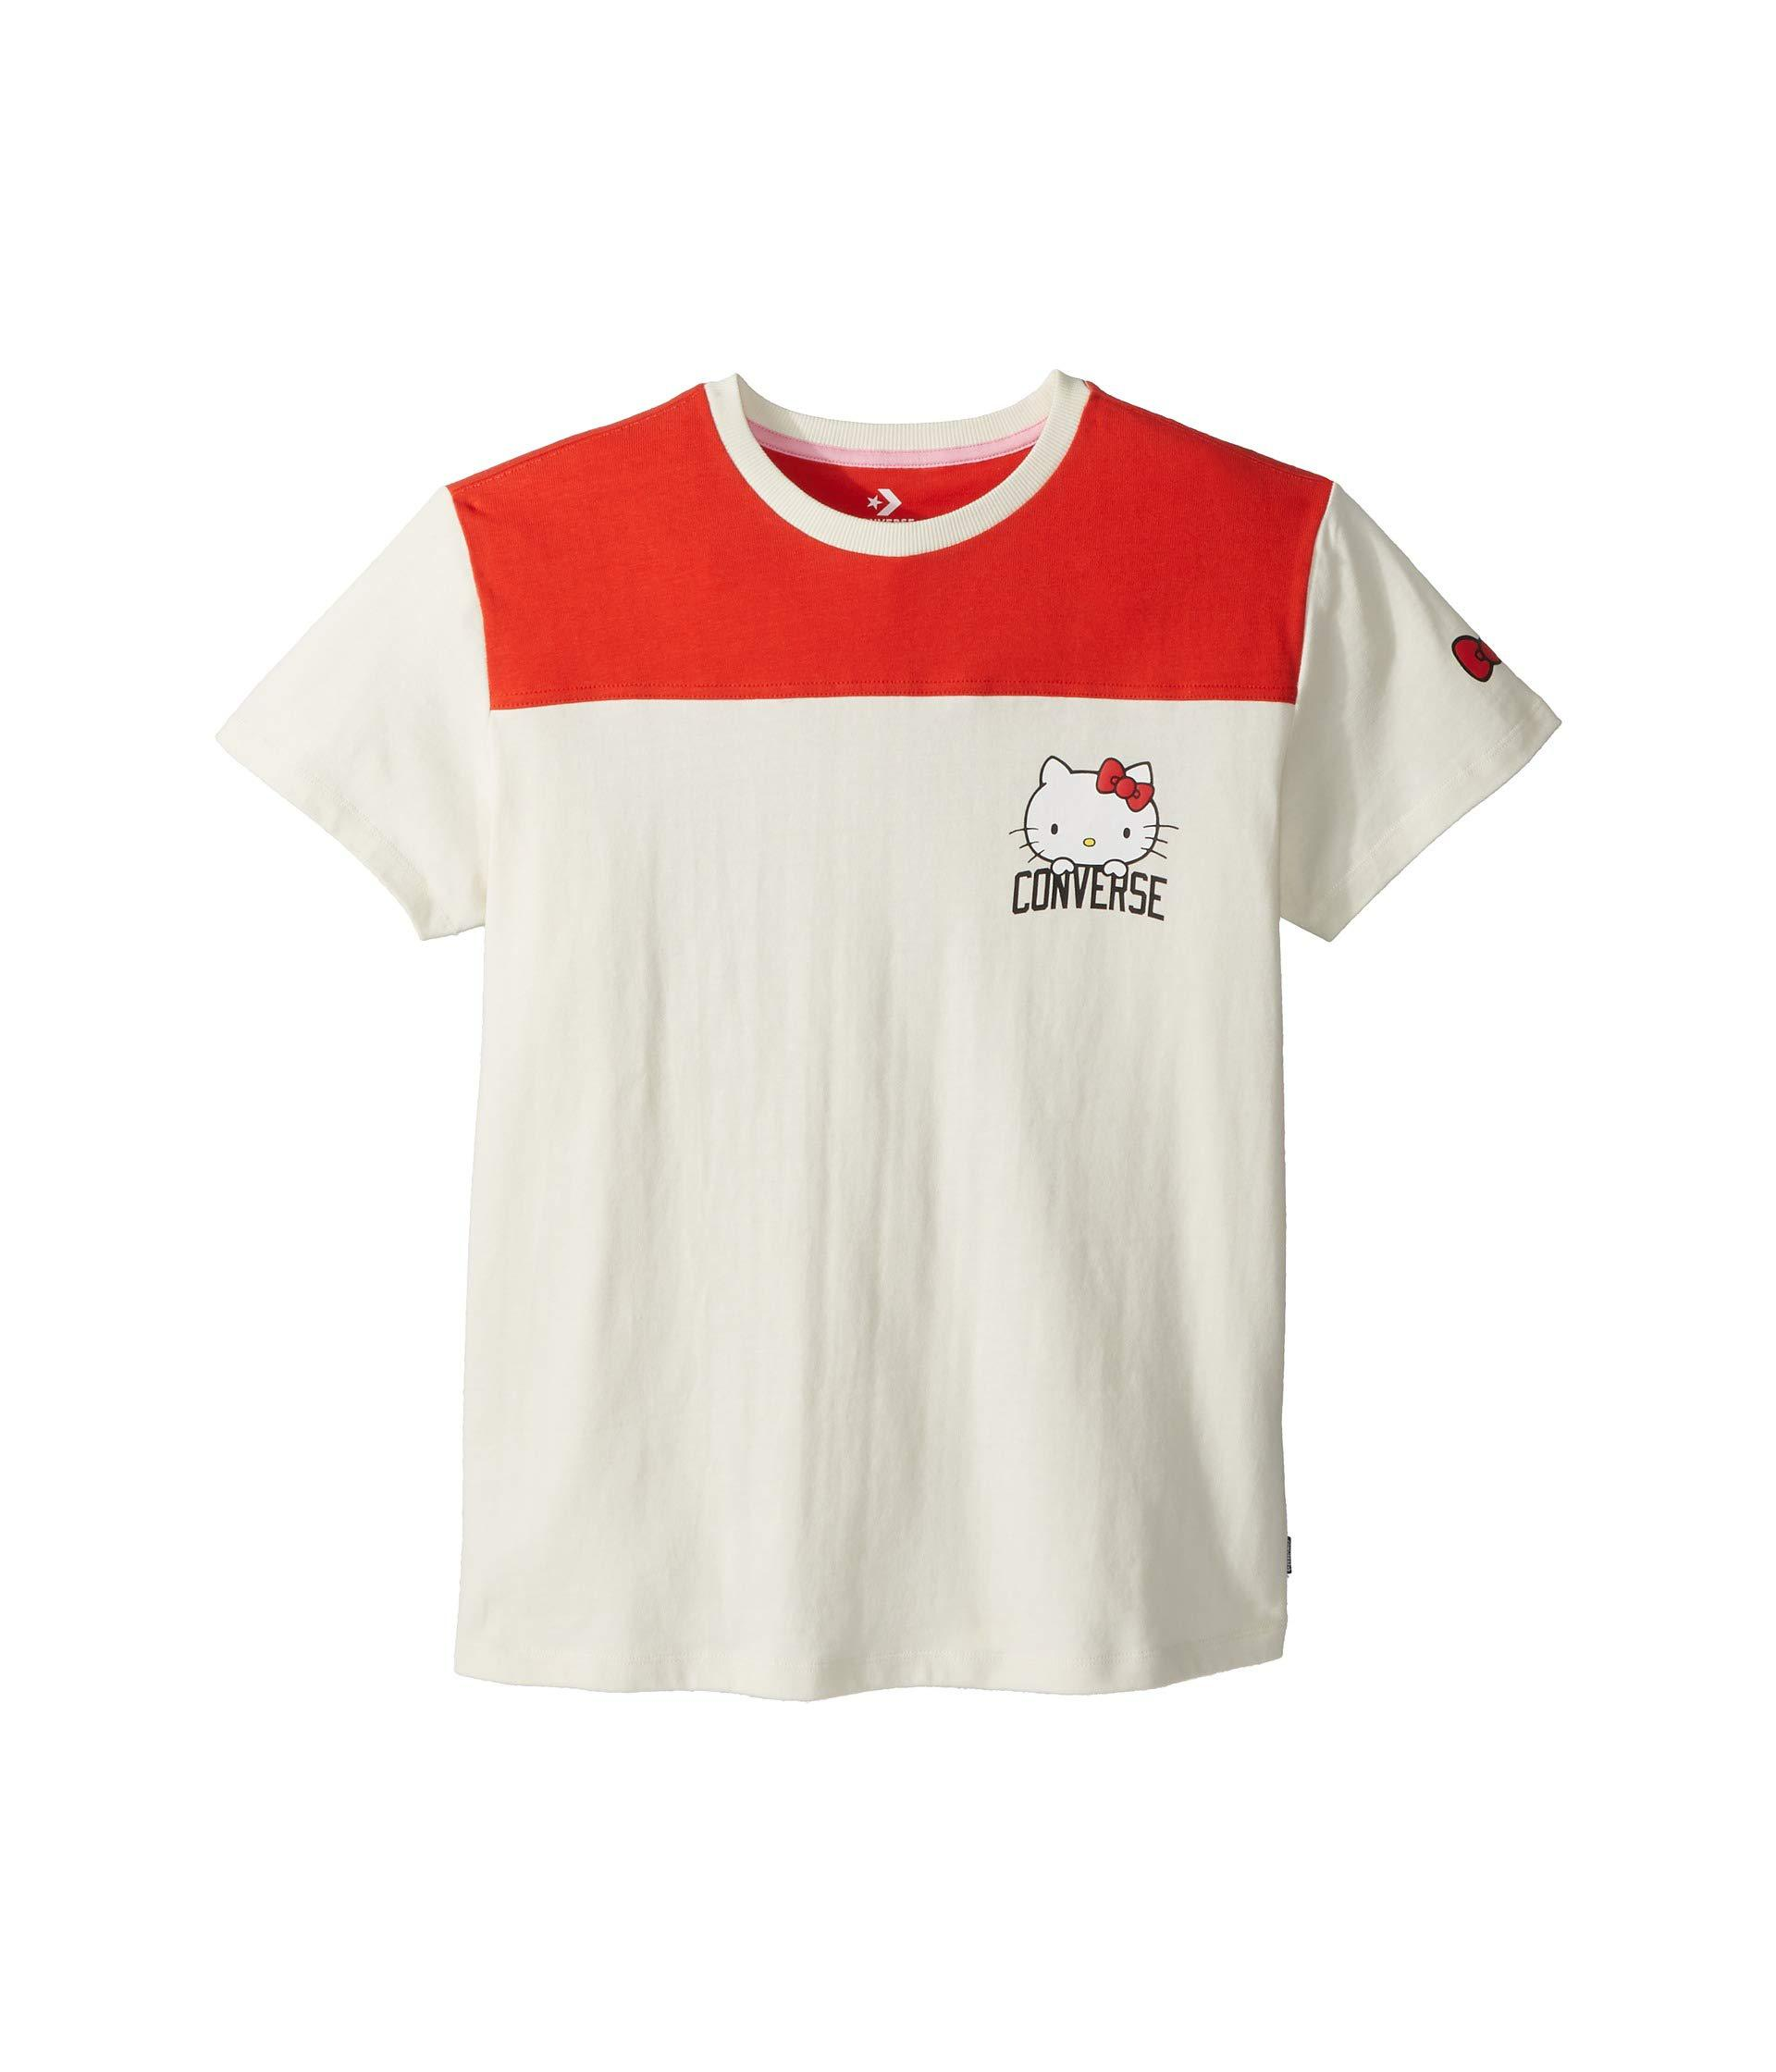 8573908f Converse - Multicolor X Hello Kitty Football T-shirt - Lyst. View fullscreen